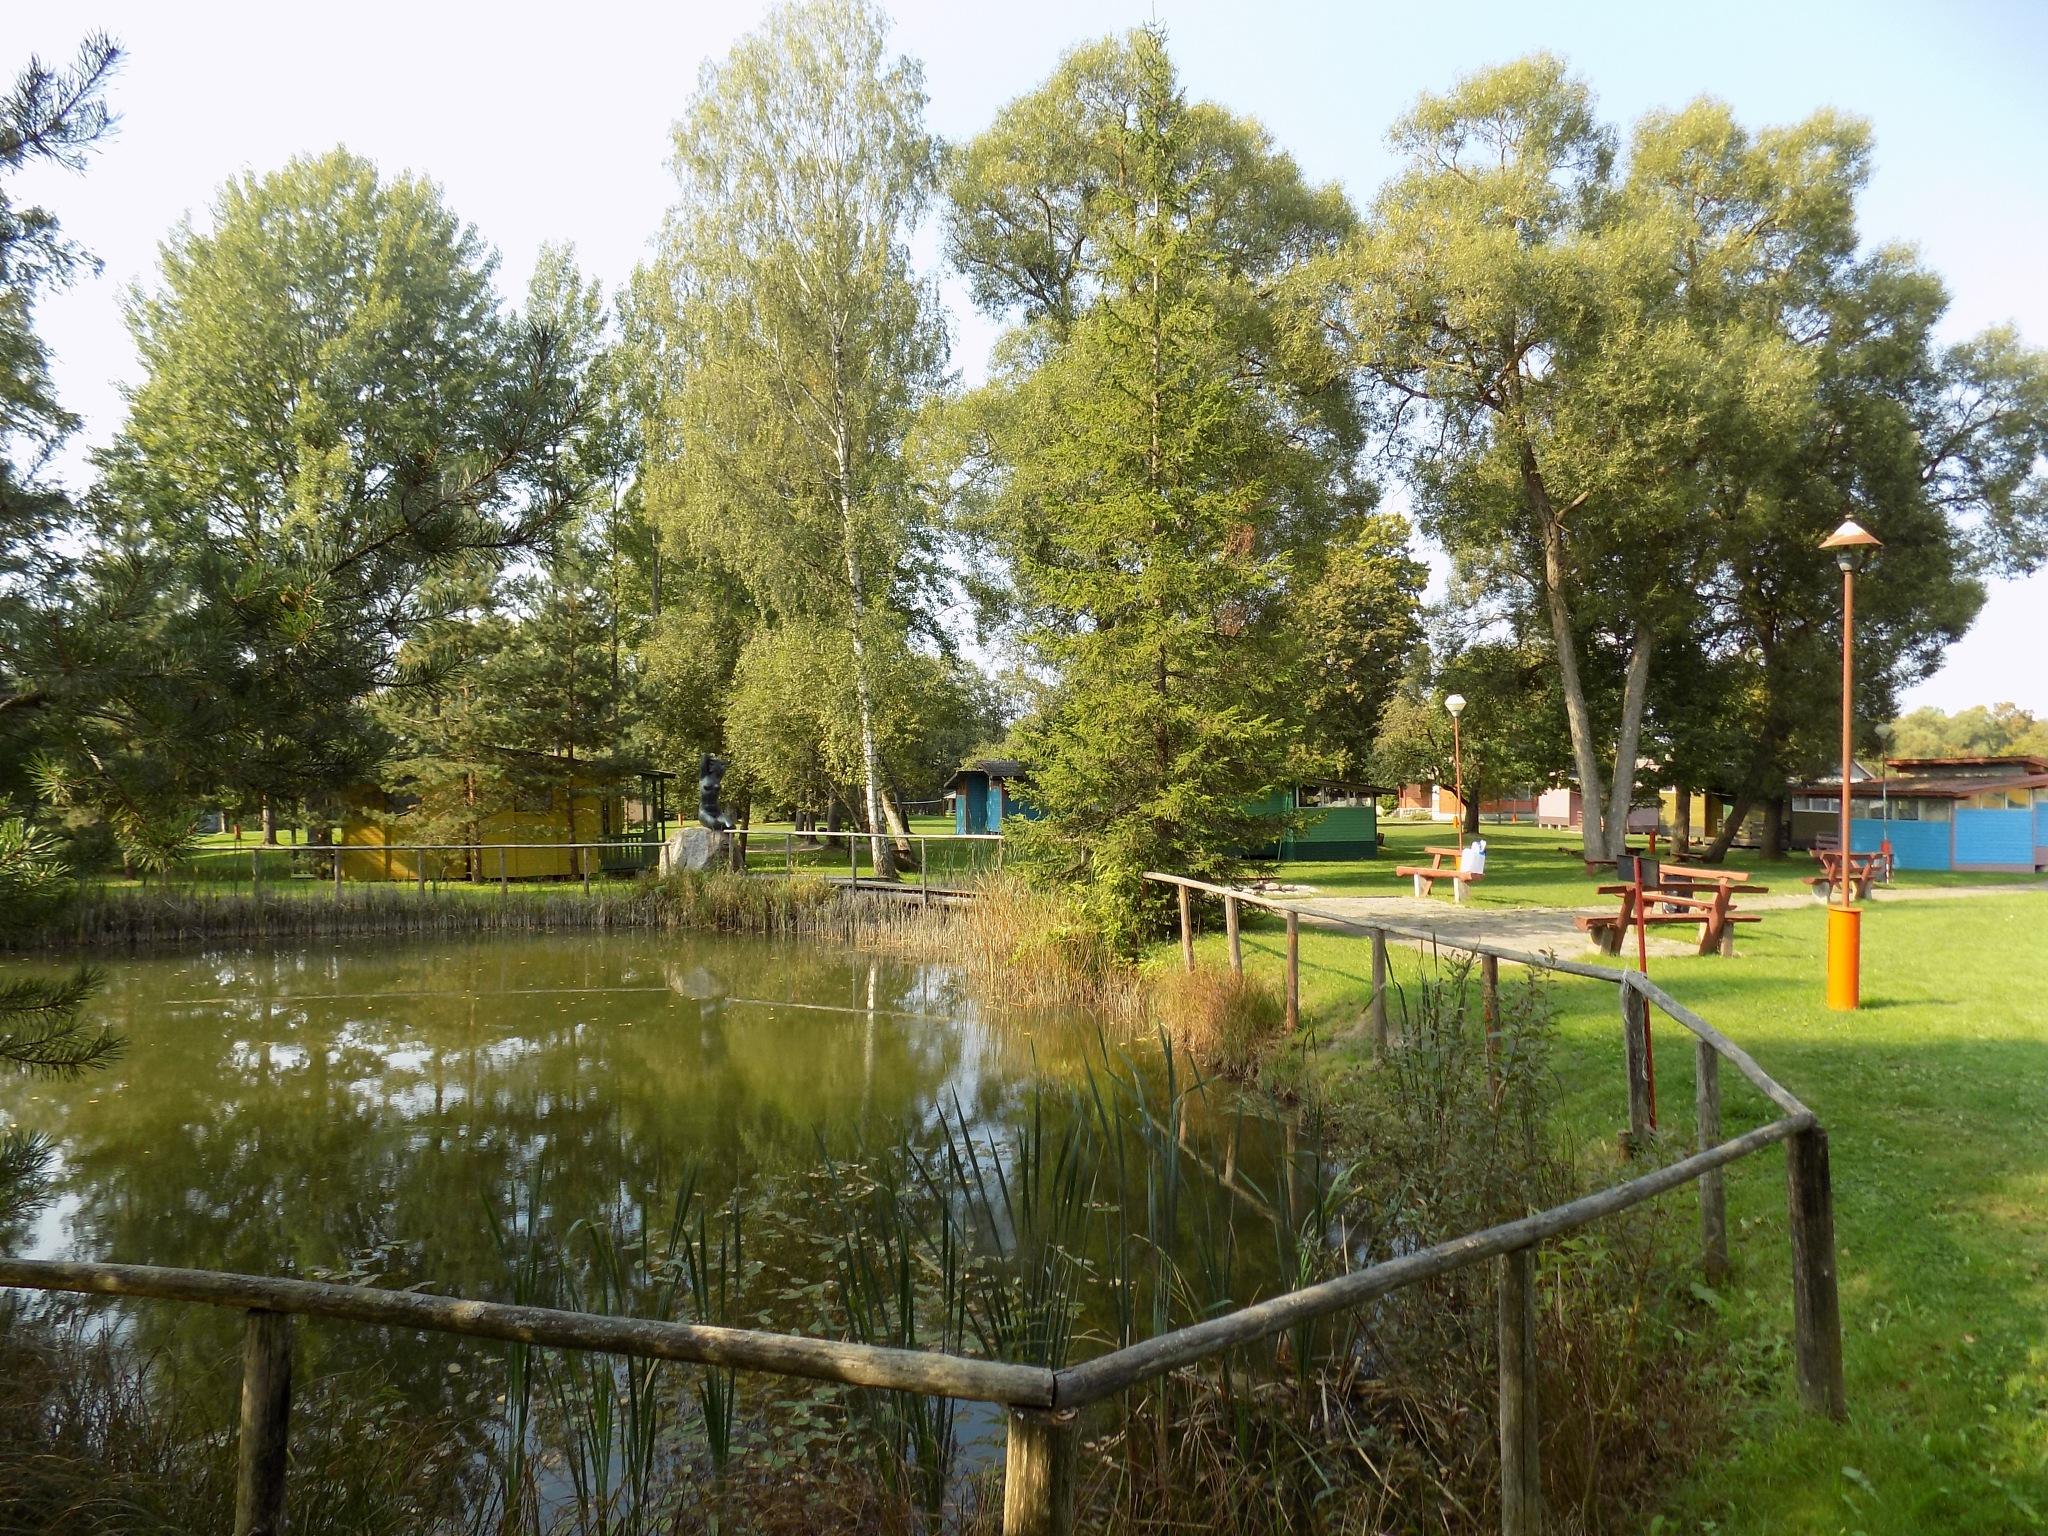 Pond and trees by uzkuraitiene62